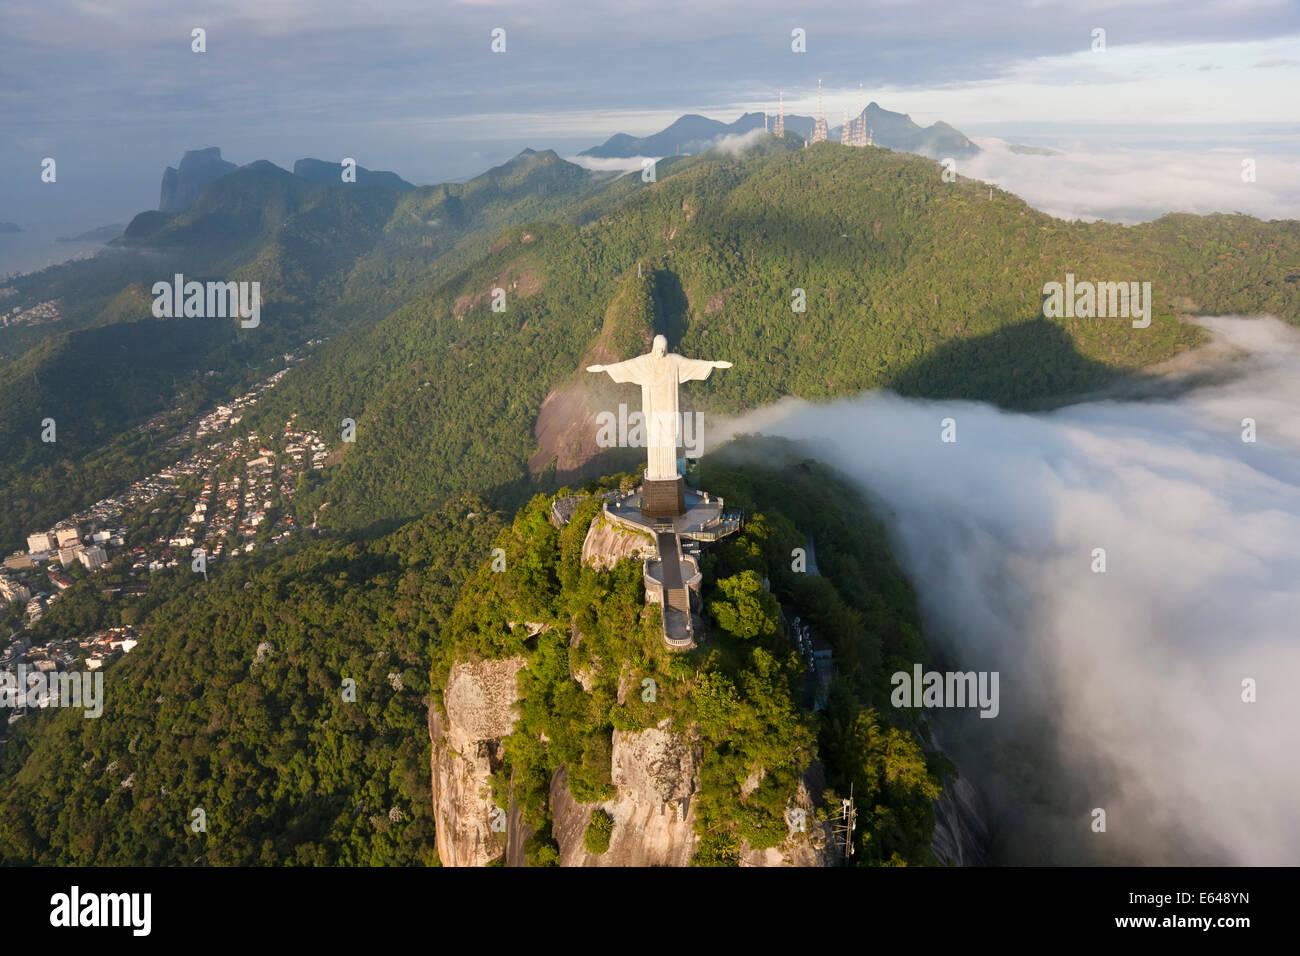 The giant Art Deco statue Jesus known as Cristo Redentor (Christ Redeemer) on Corcovado mountain in Rio de Janeiro Stock Photo